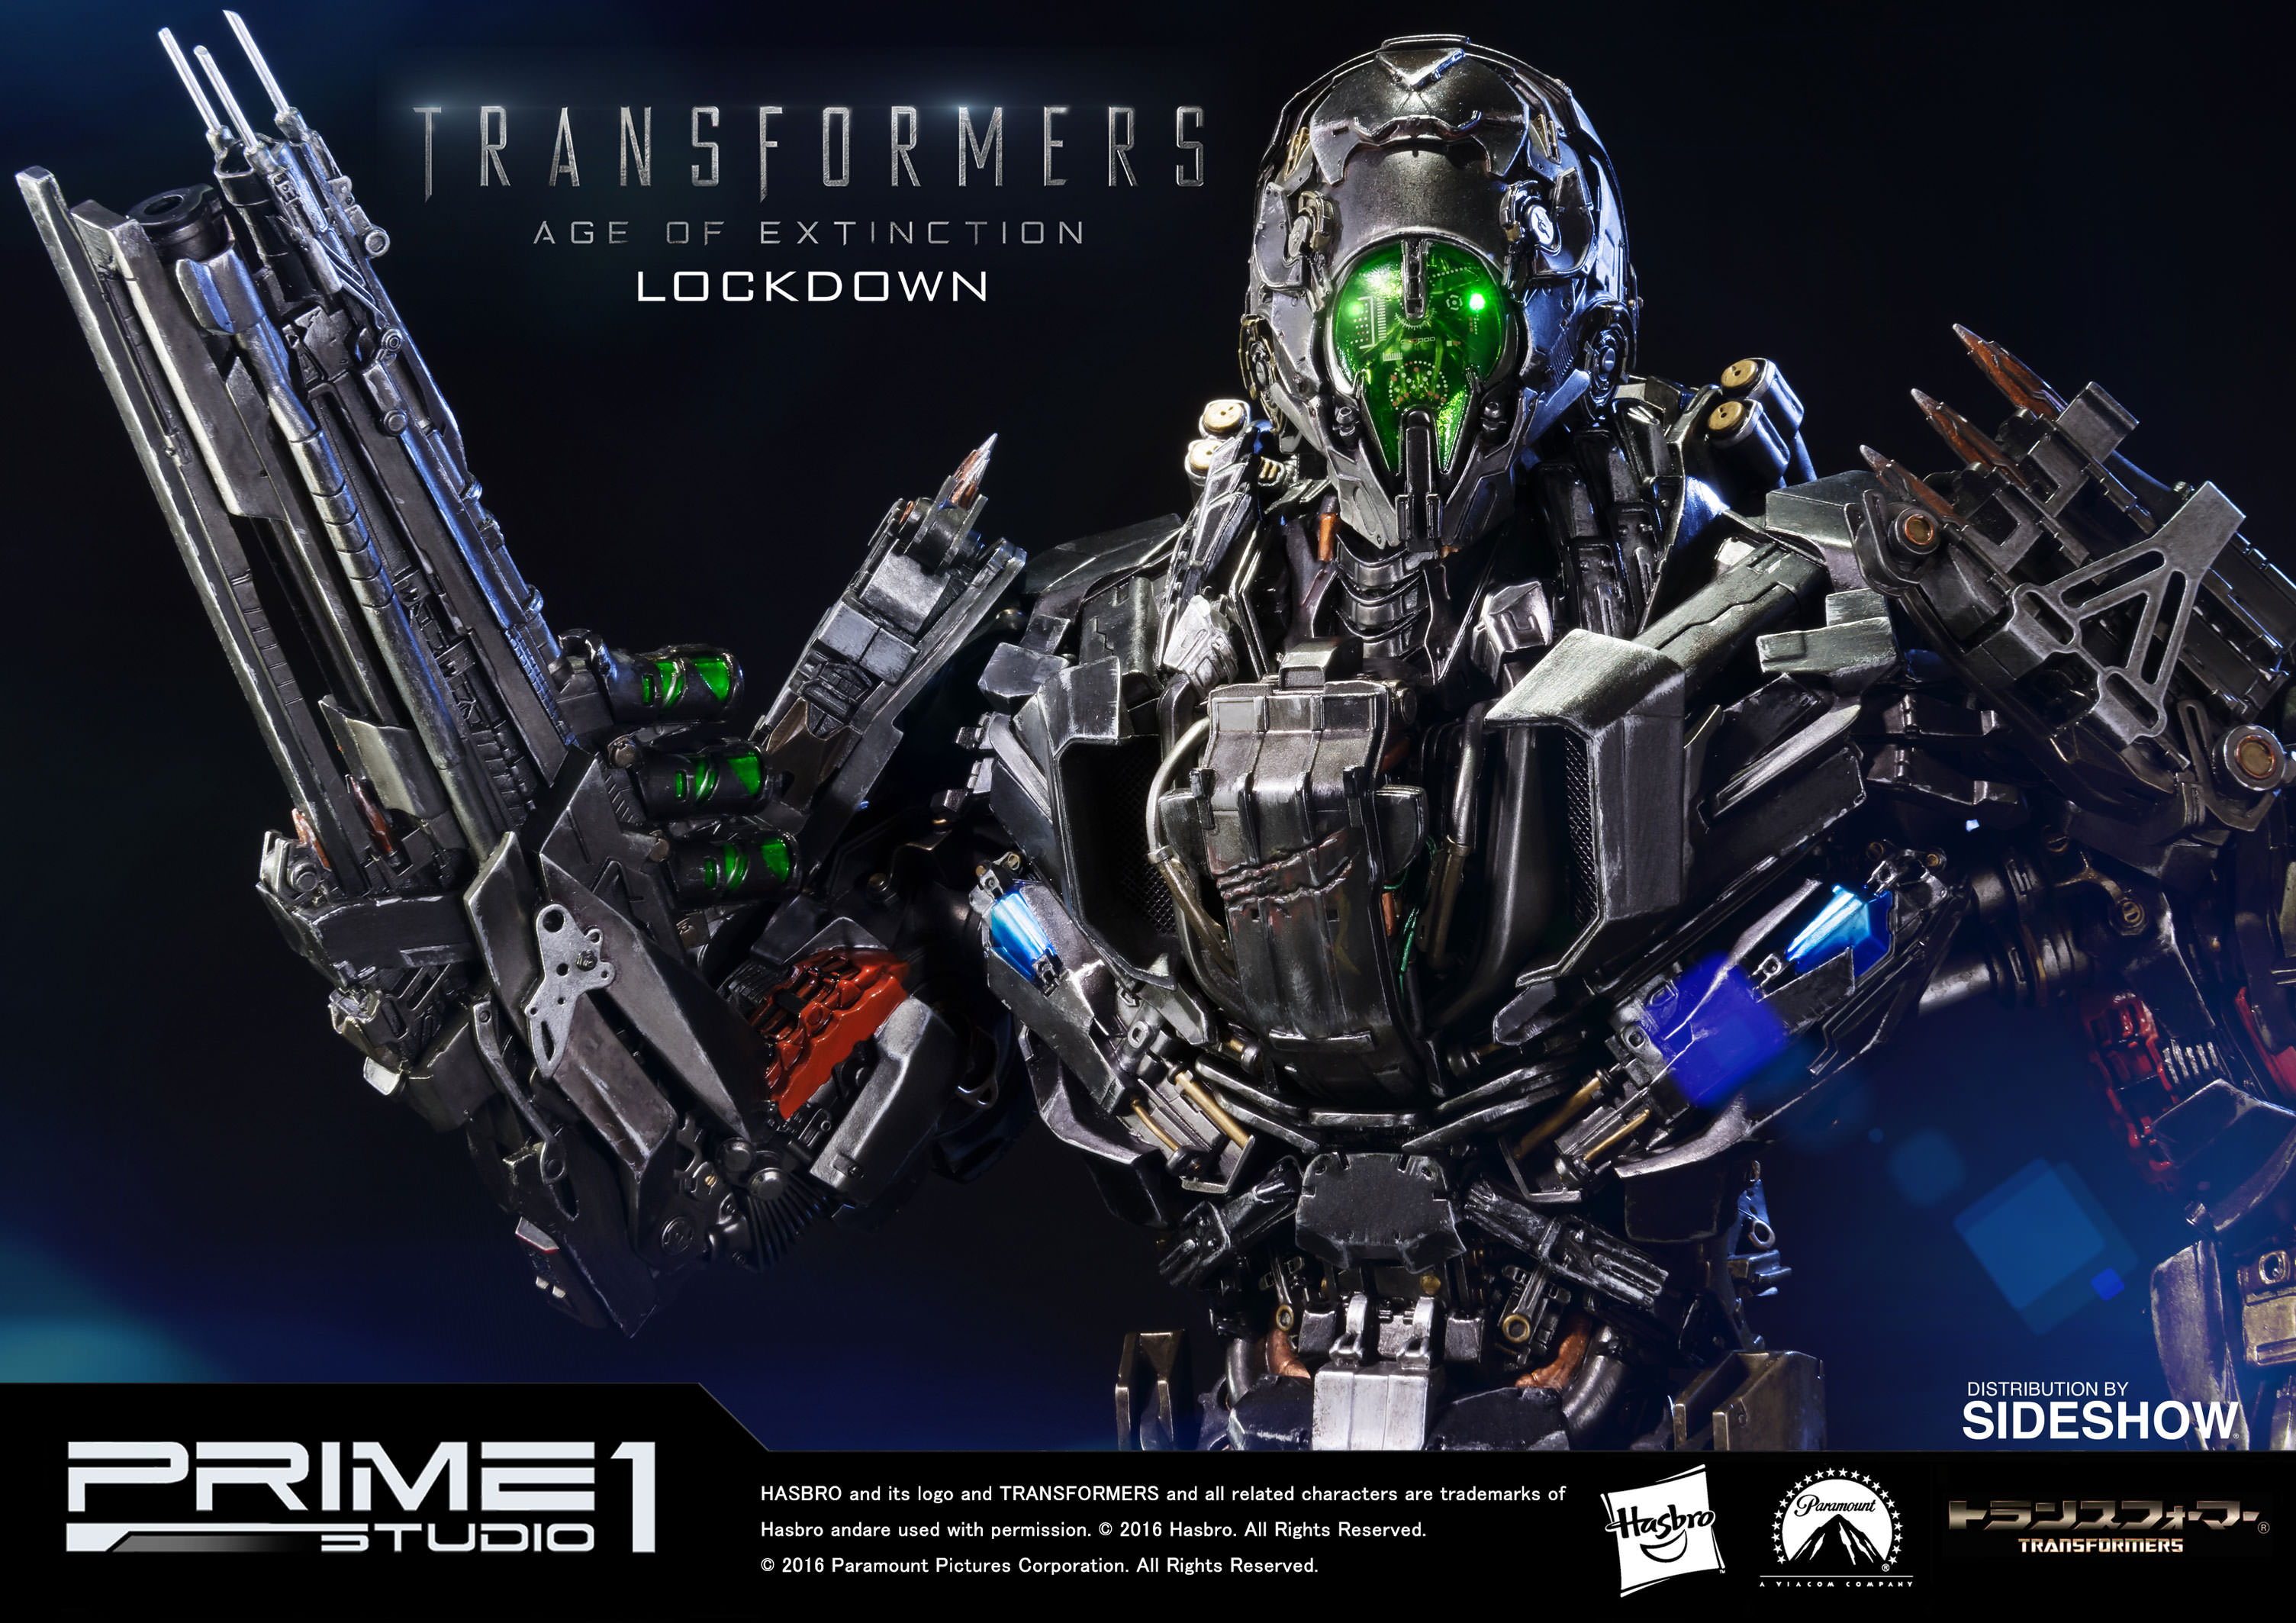 Transformers Lockdown Polystone Statue by Prime 1 Studio ...